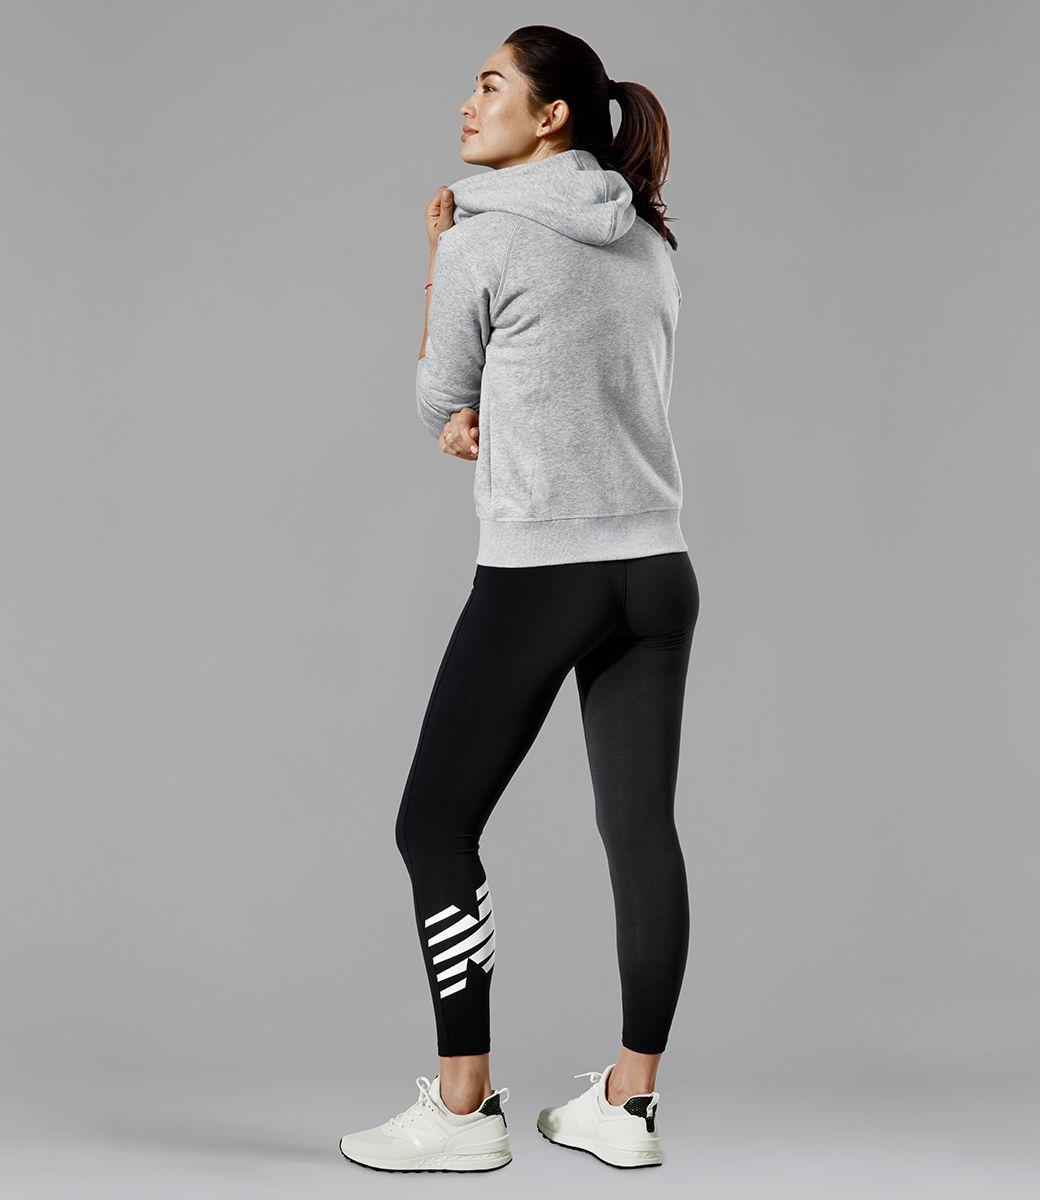 New Balance US-Womens-City-Comforts-Sporty-Urbanite,